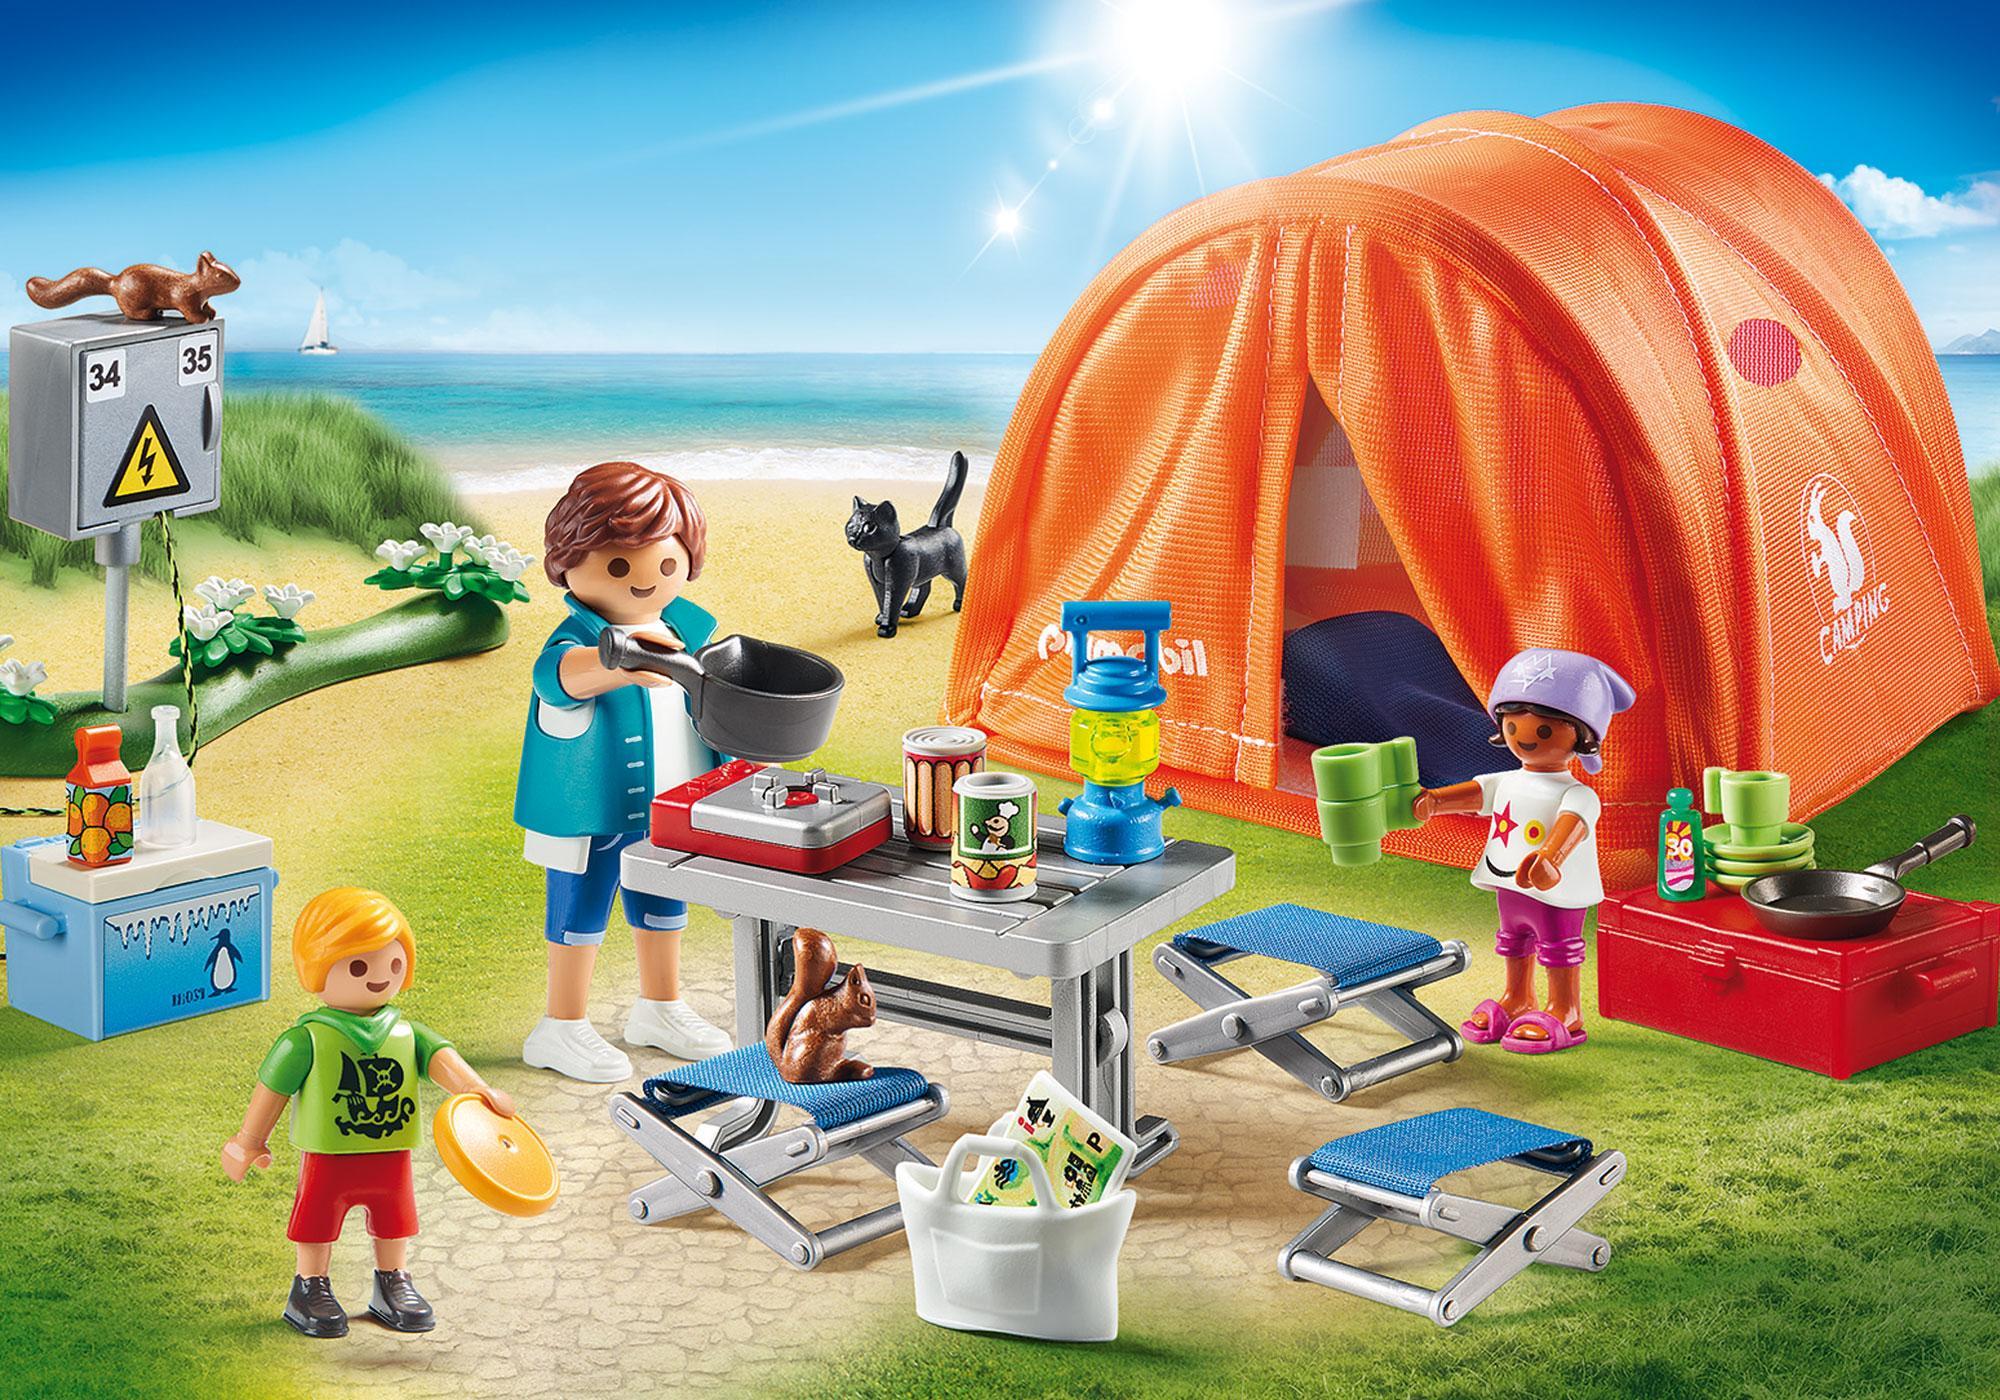 70089_product_detail/Tenda dei campeggiatori